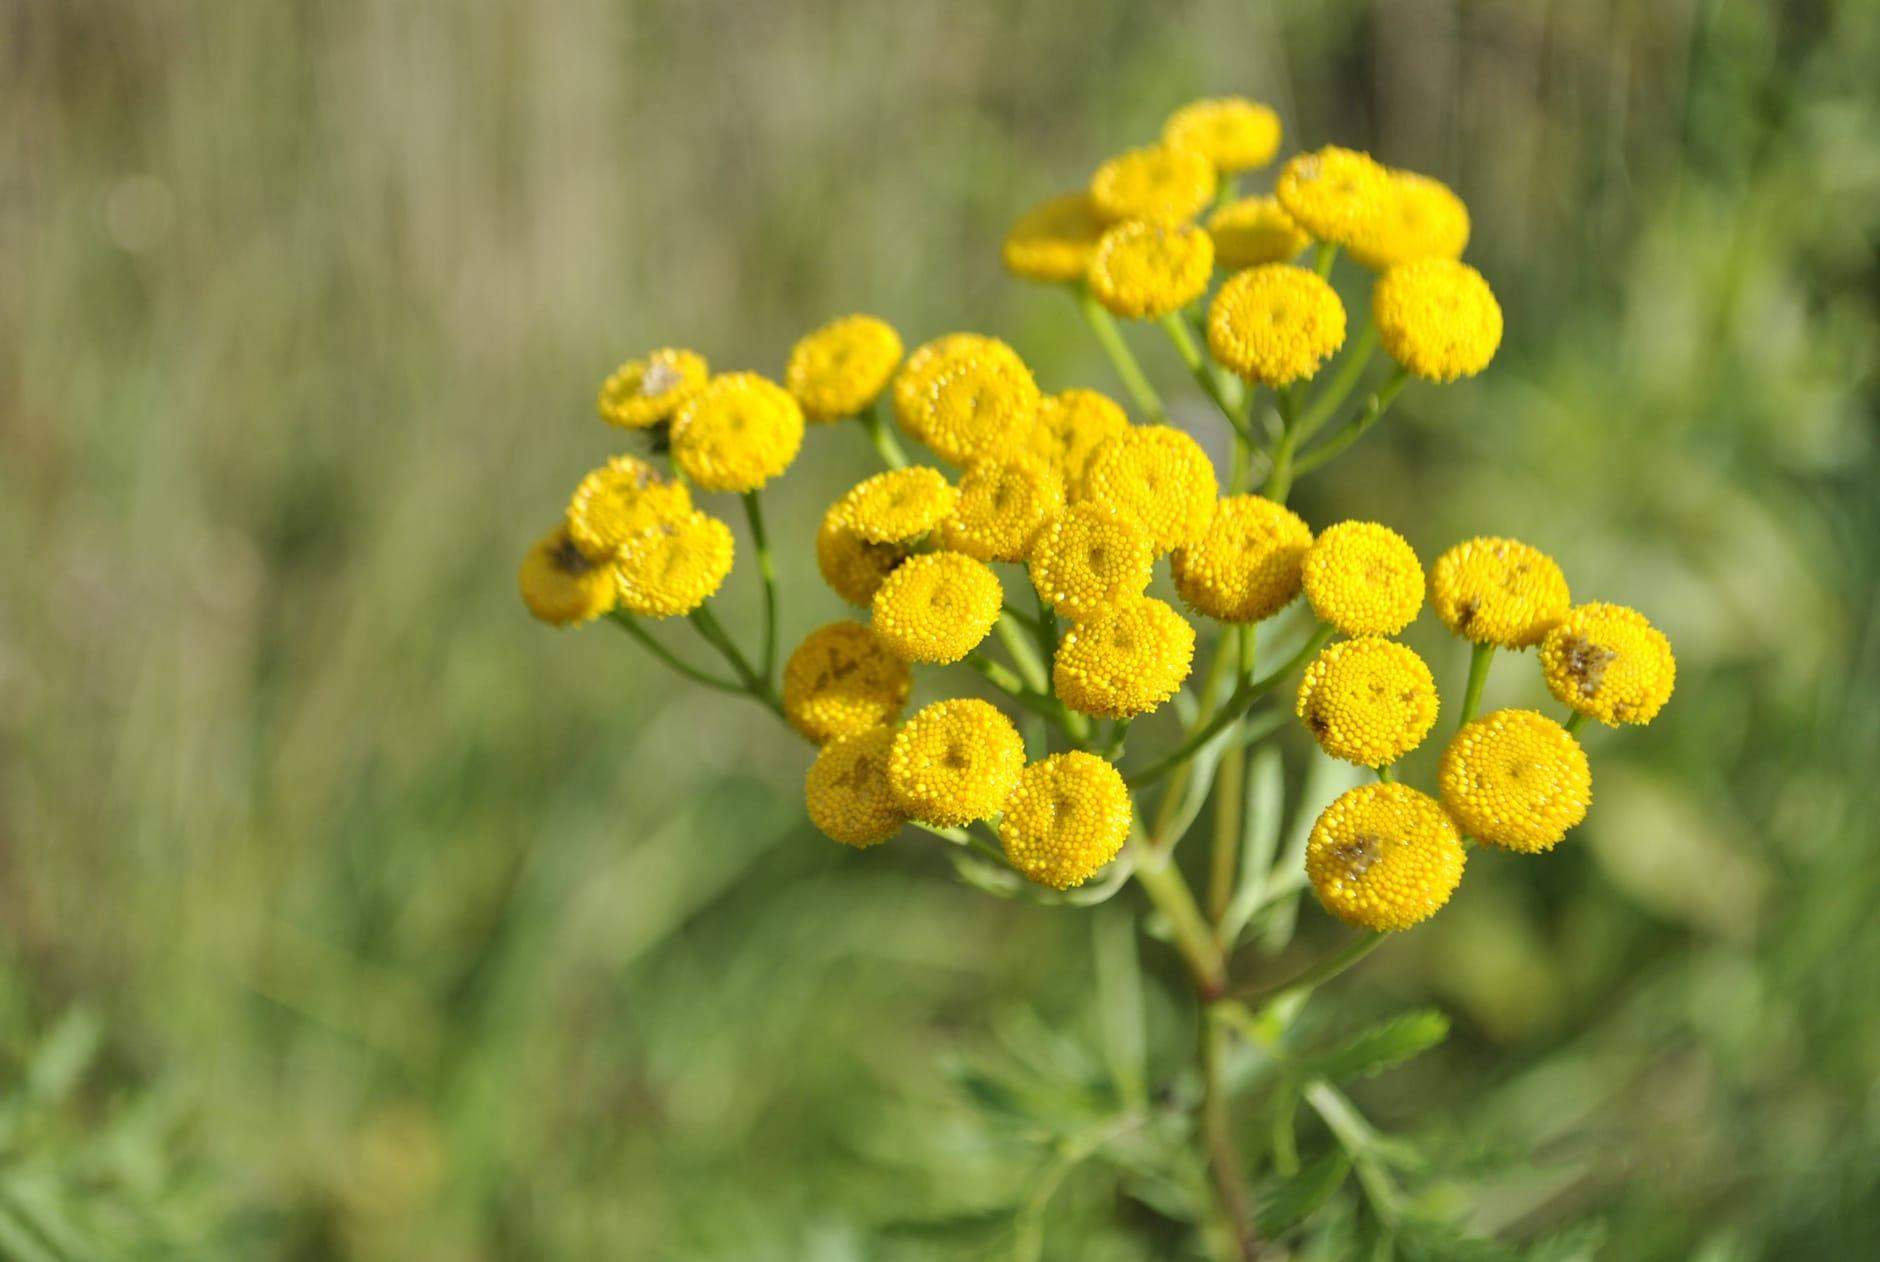 yellow flower tansy summer on a green background heat village garden